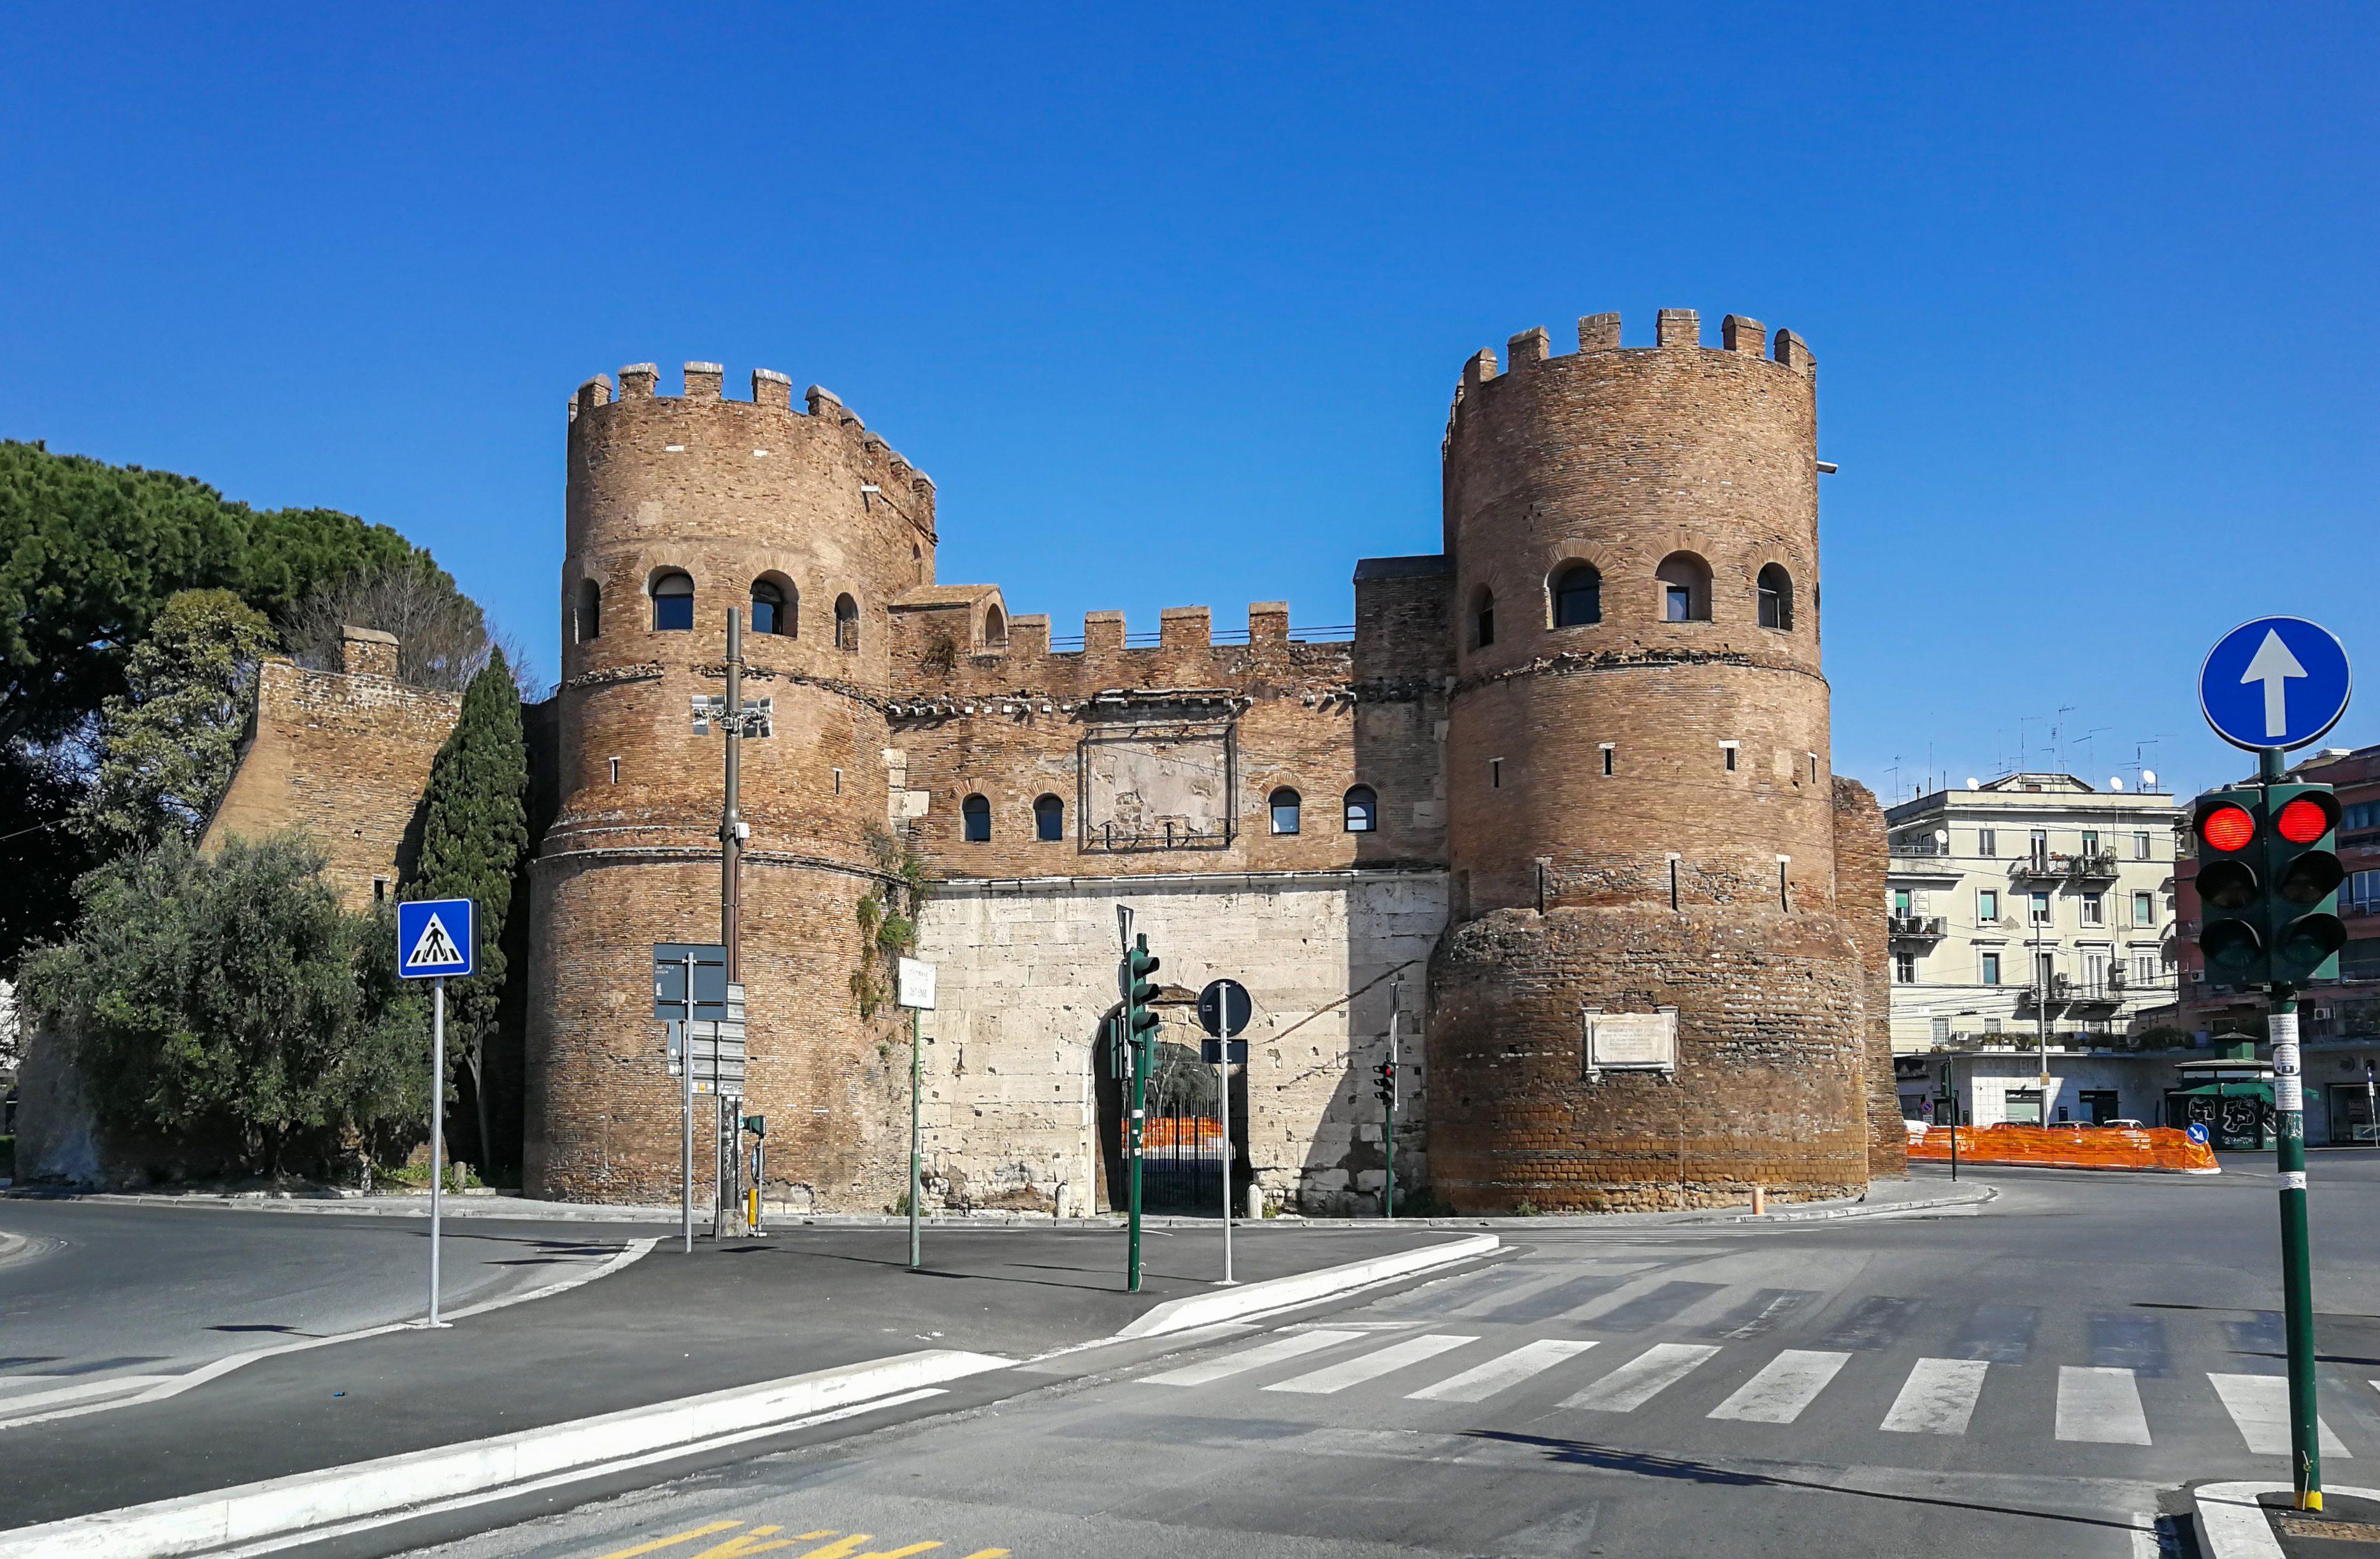 The coronavirus outbreak in Italy